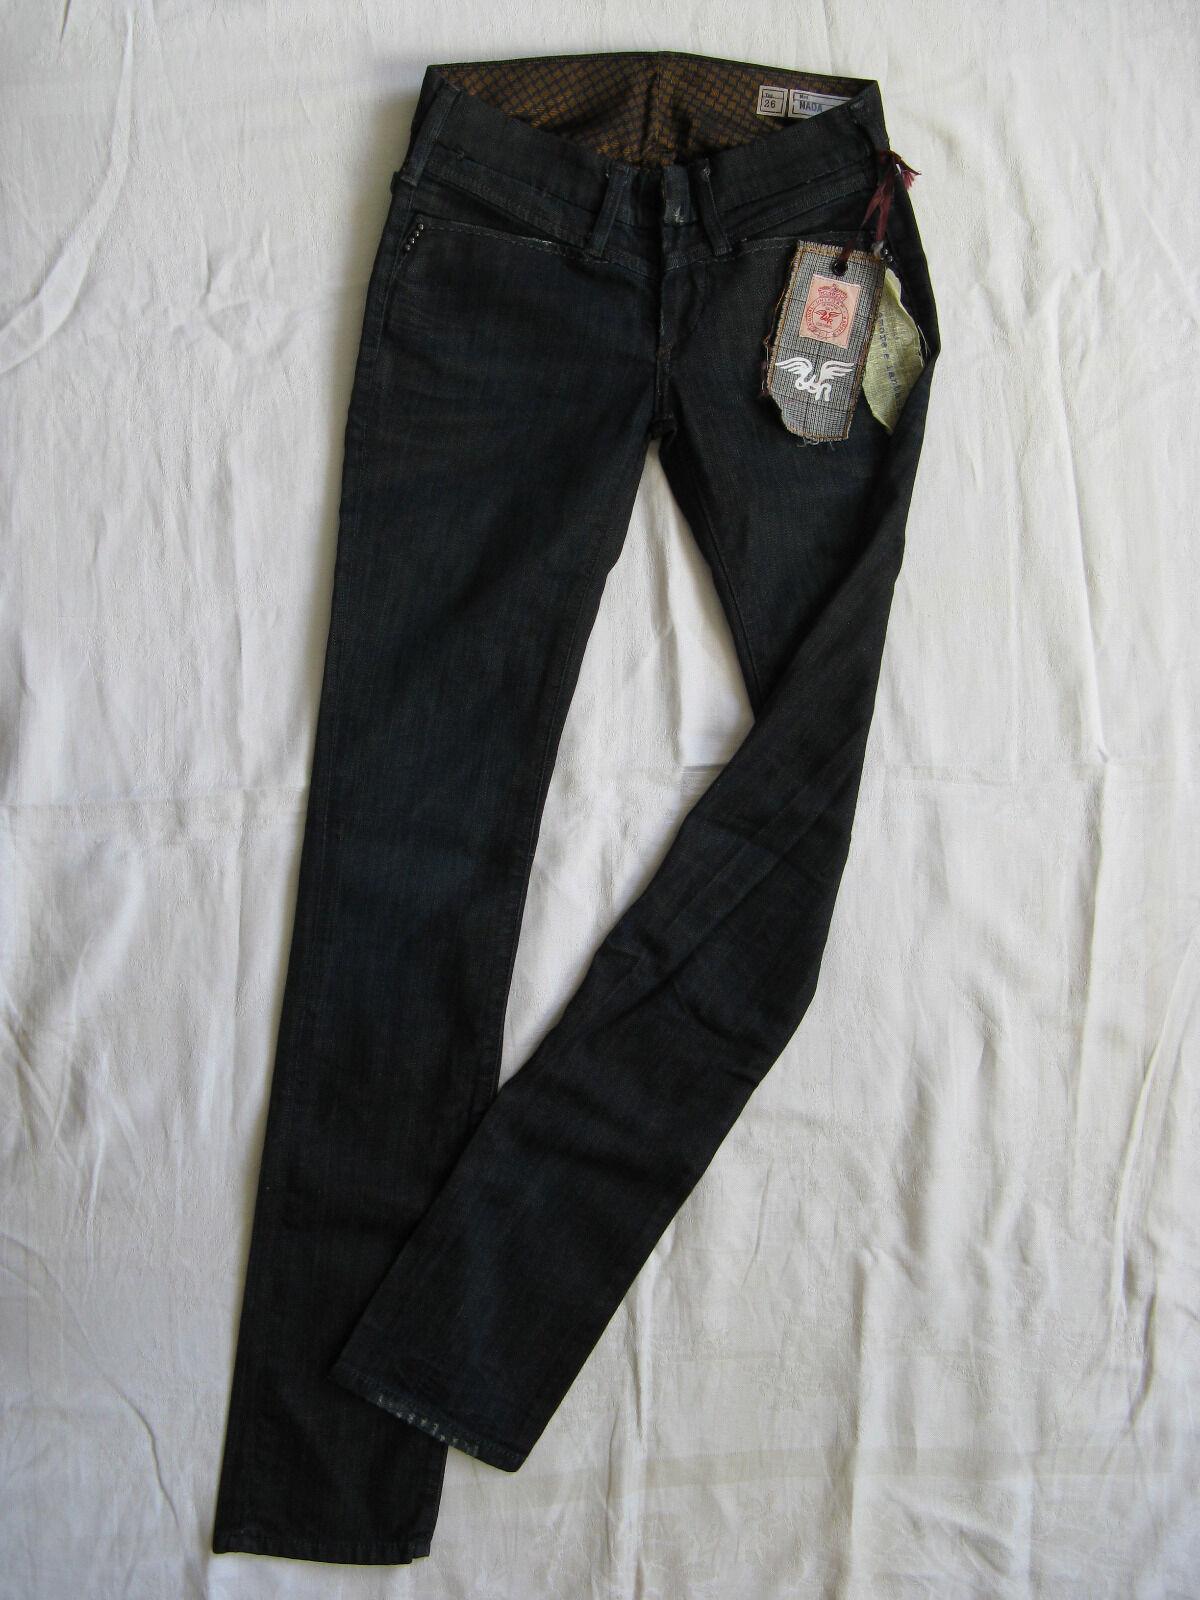 We ARE REPLAY DA DONNA blu JEANS STRETCH w26 l34 Low Waist Slim Fit Straight Leg